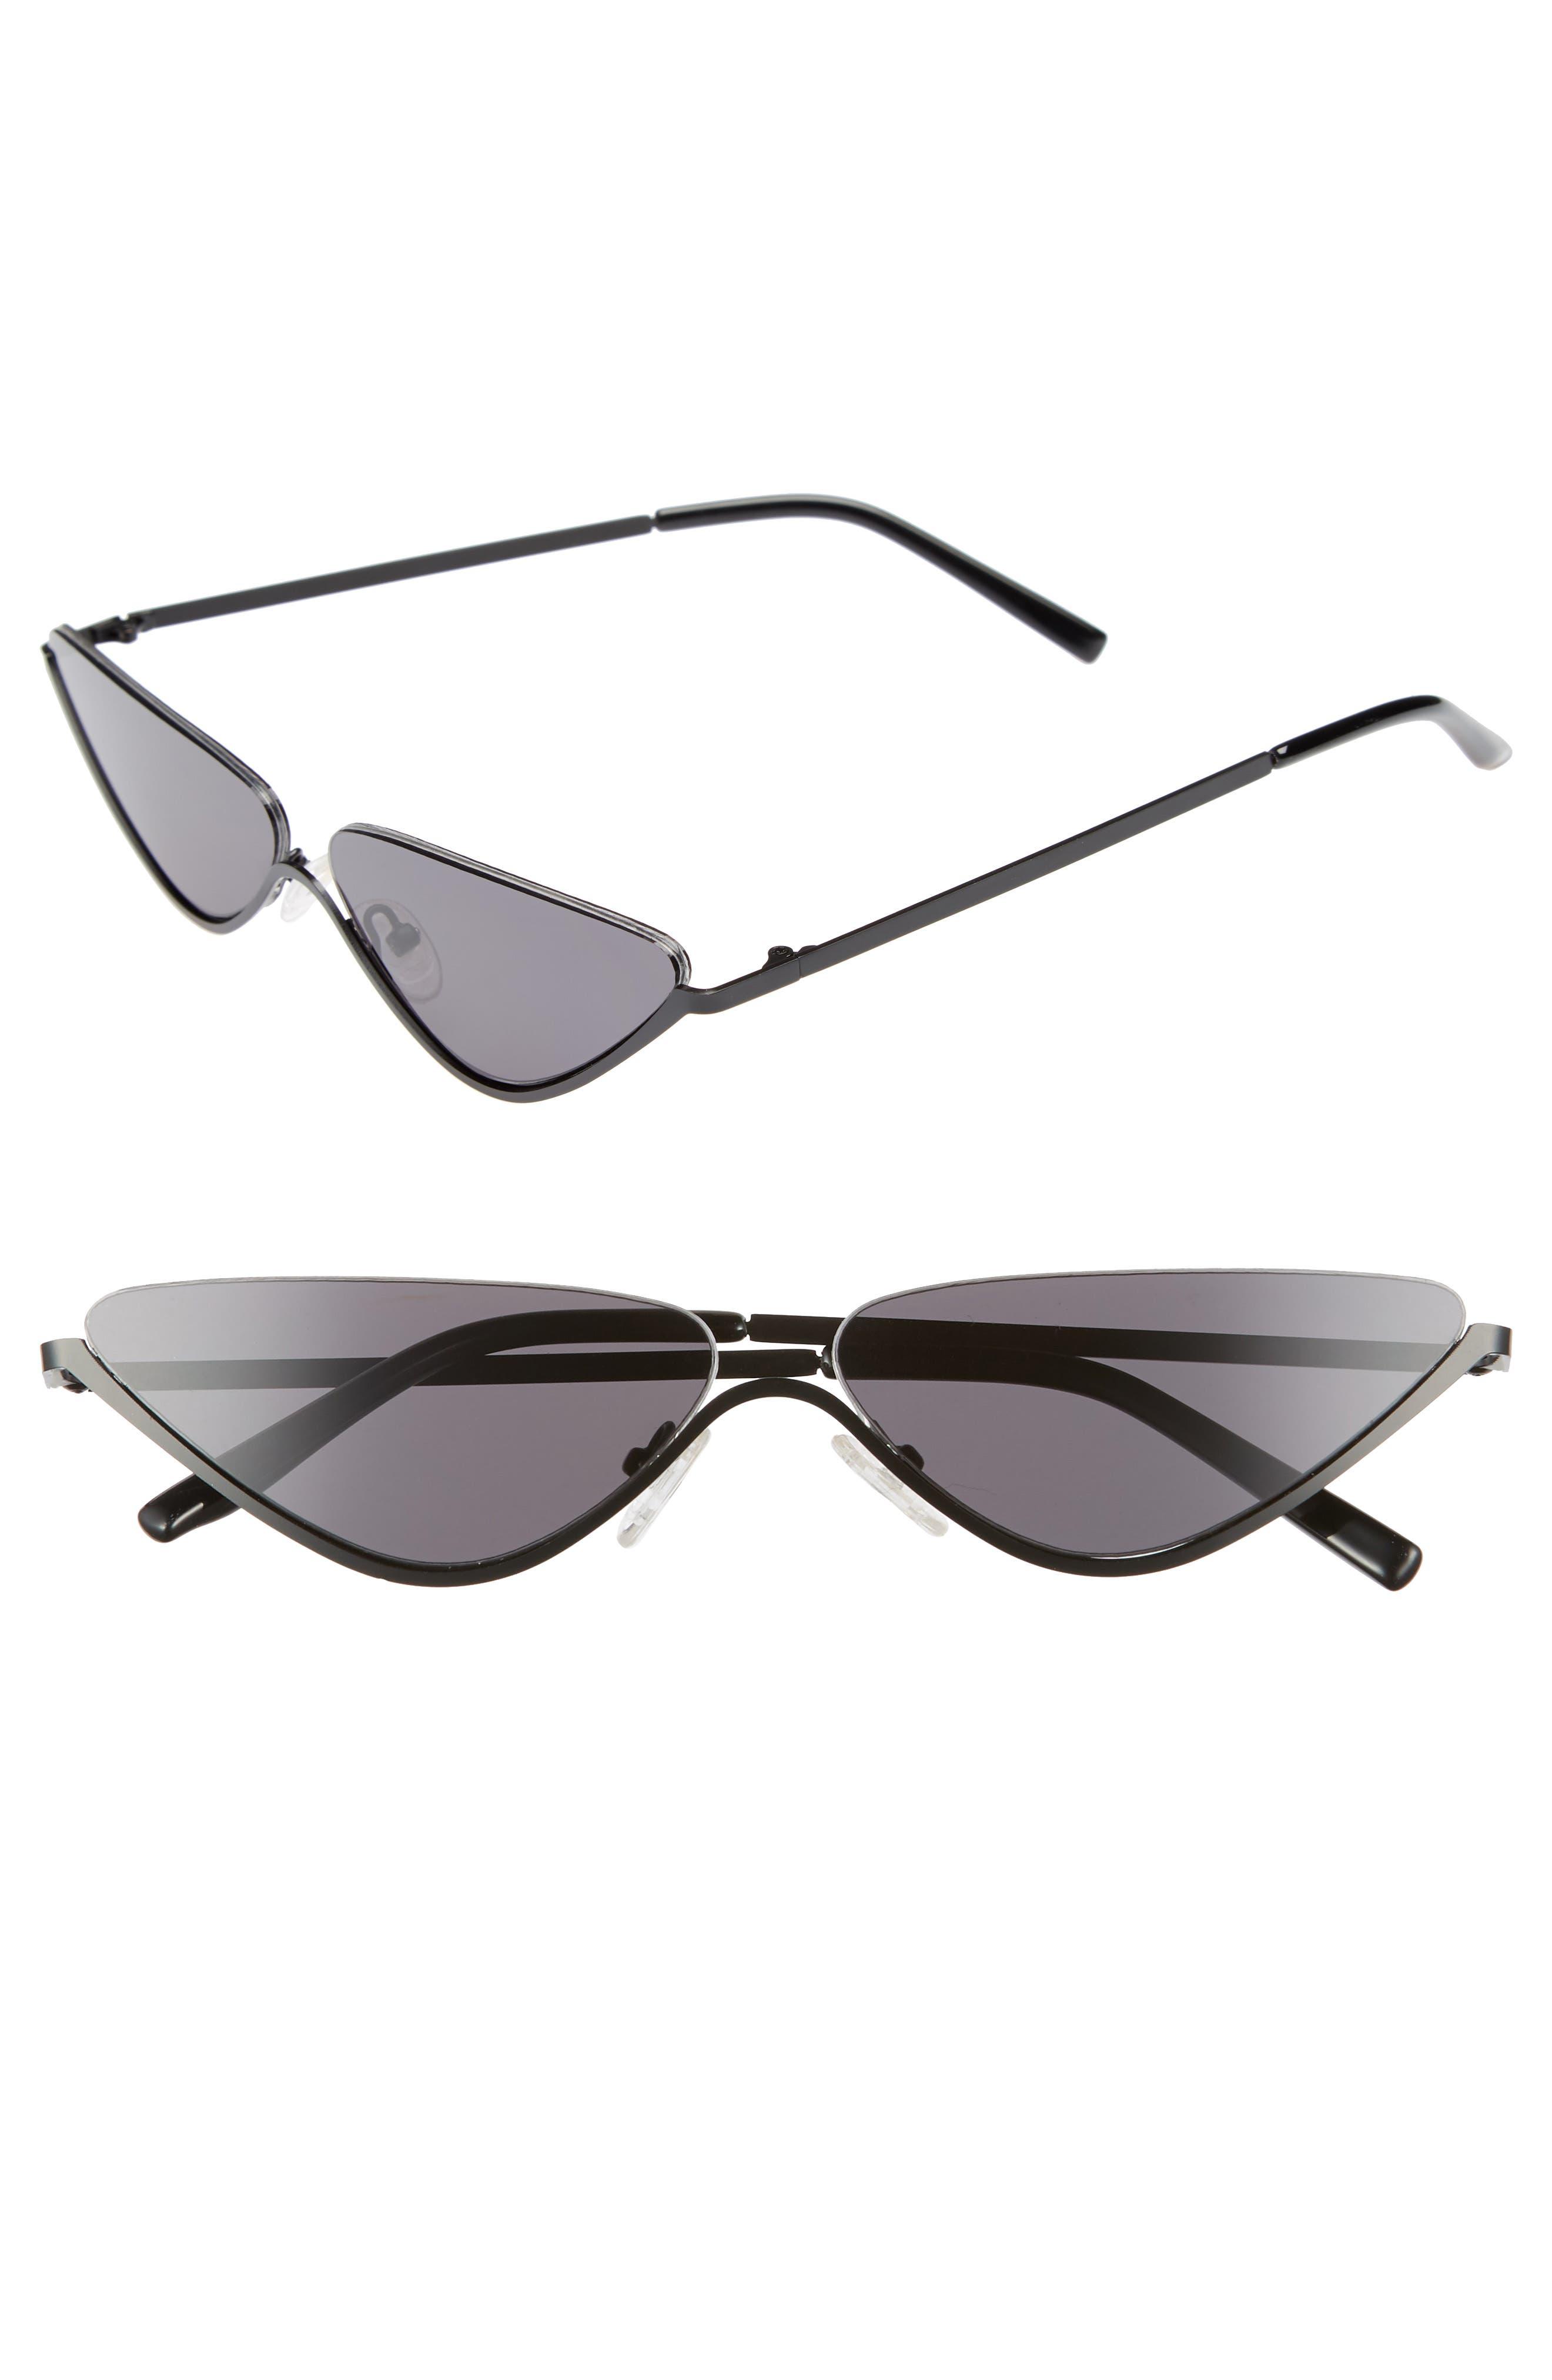 62mm Half Rim Cat Eye Sunglasses,                             Main thumbnail 1, color,                             001